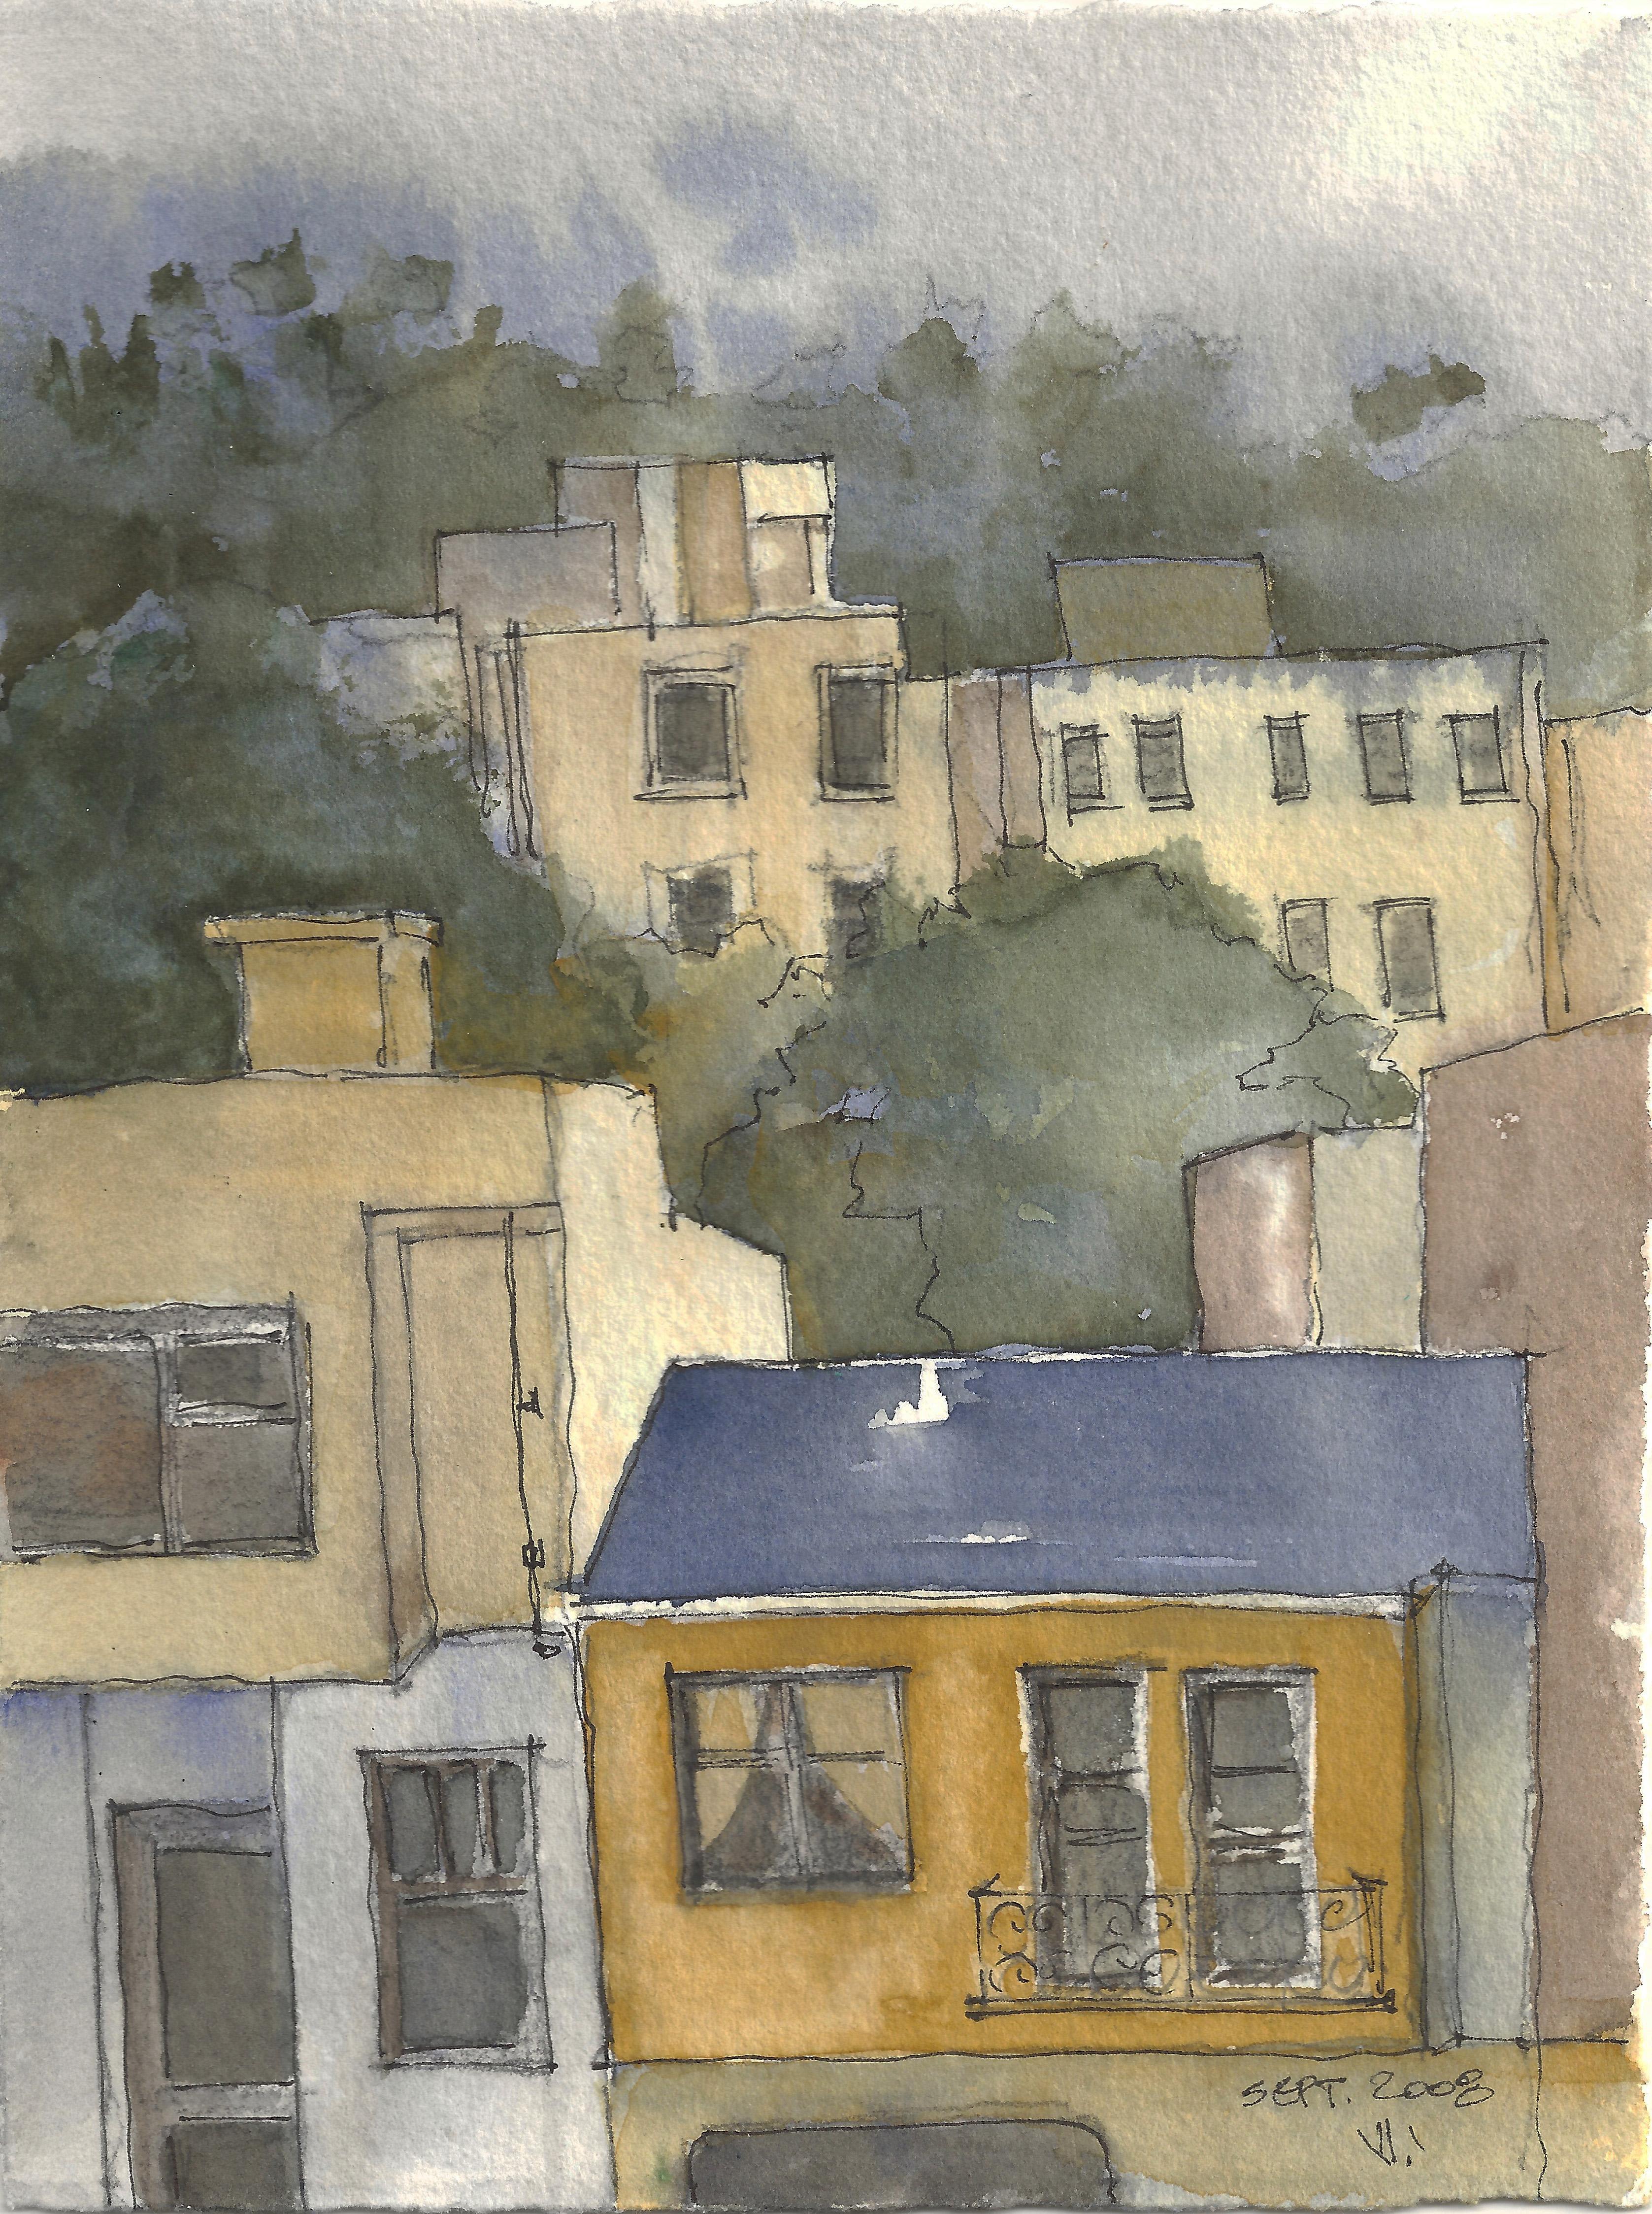 2008 San Francisco I